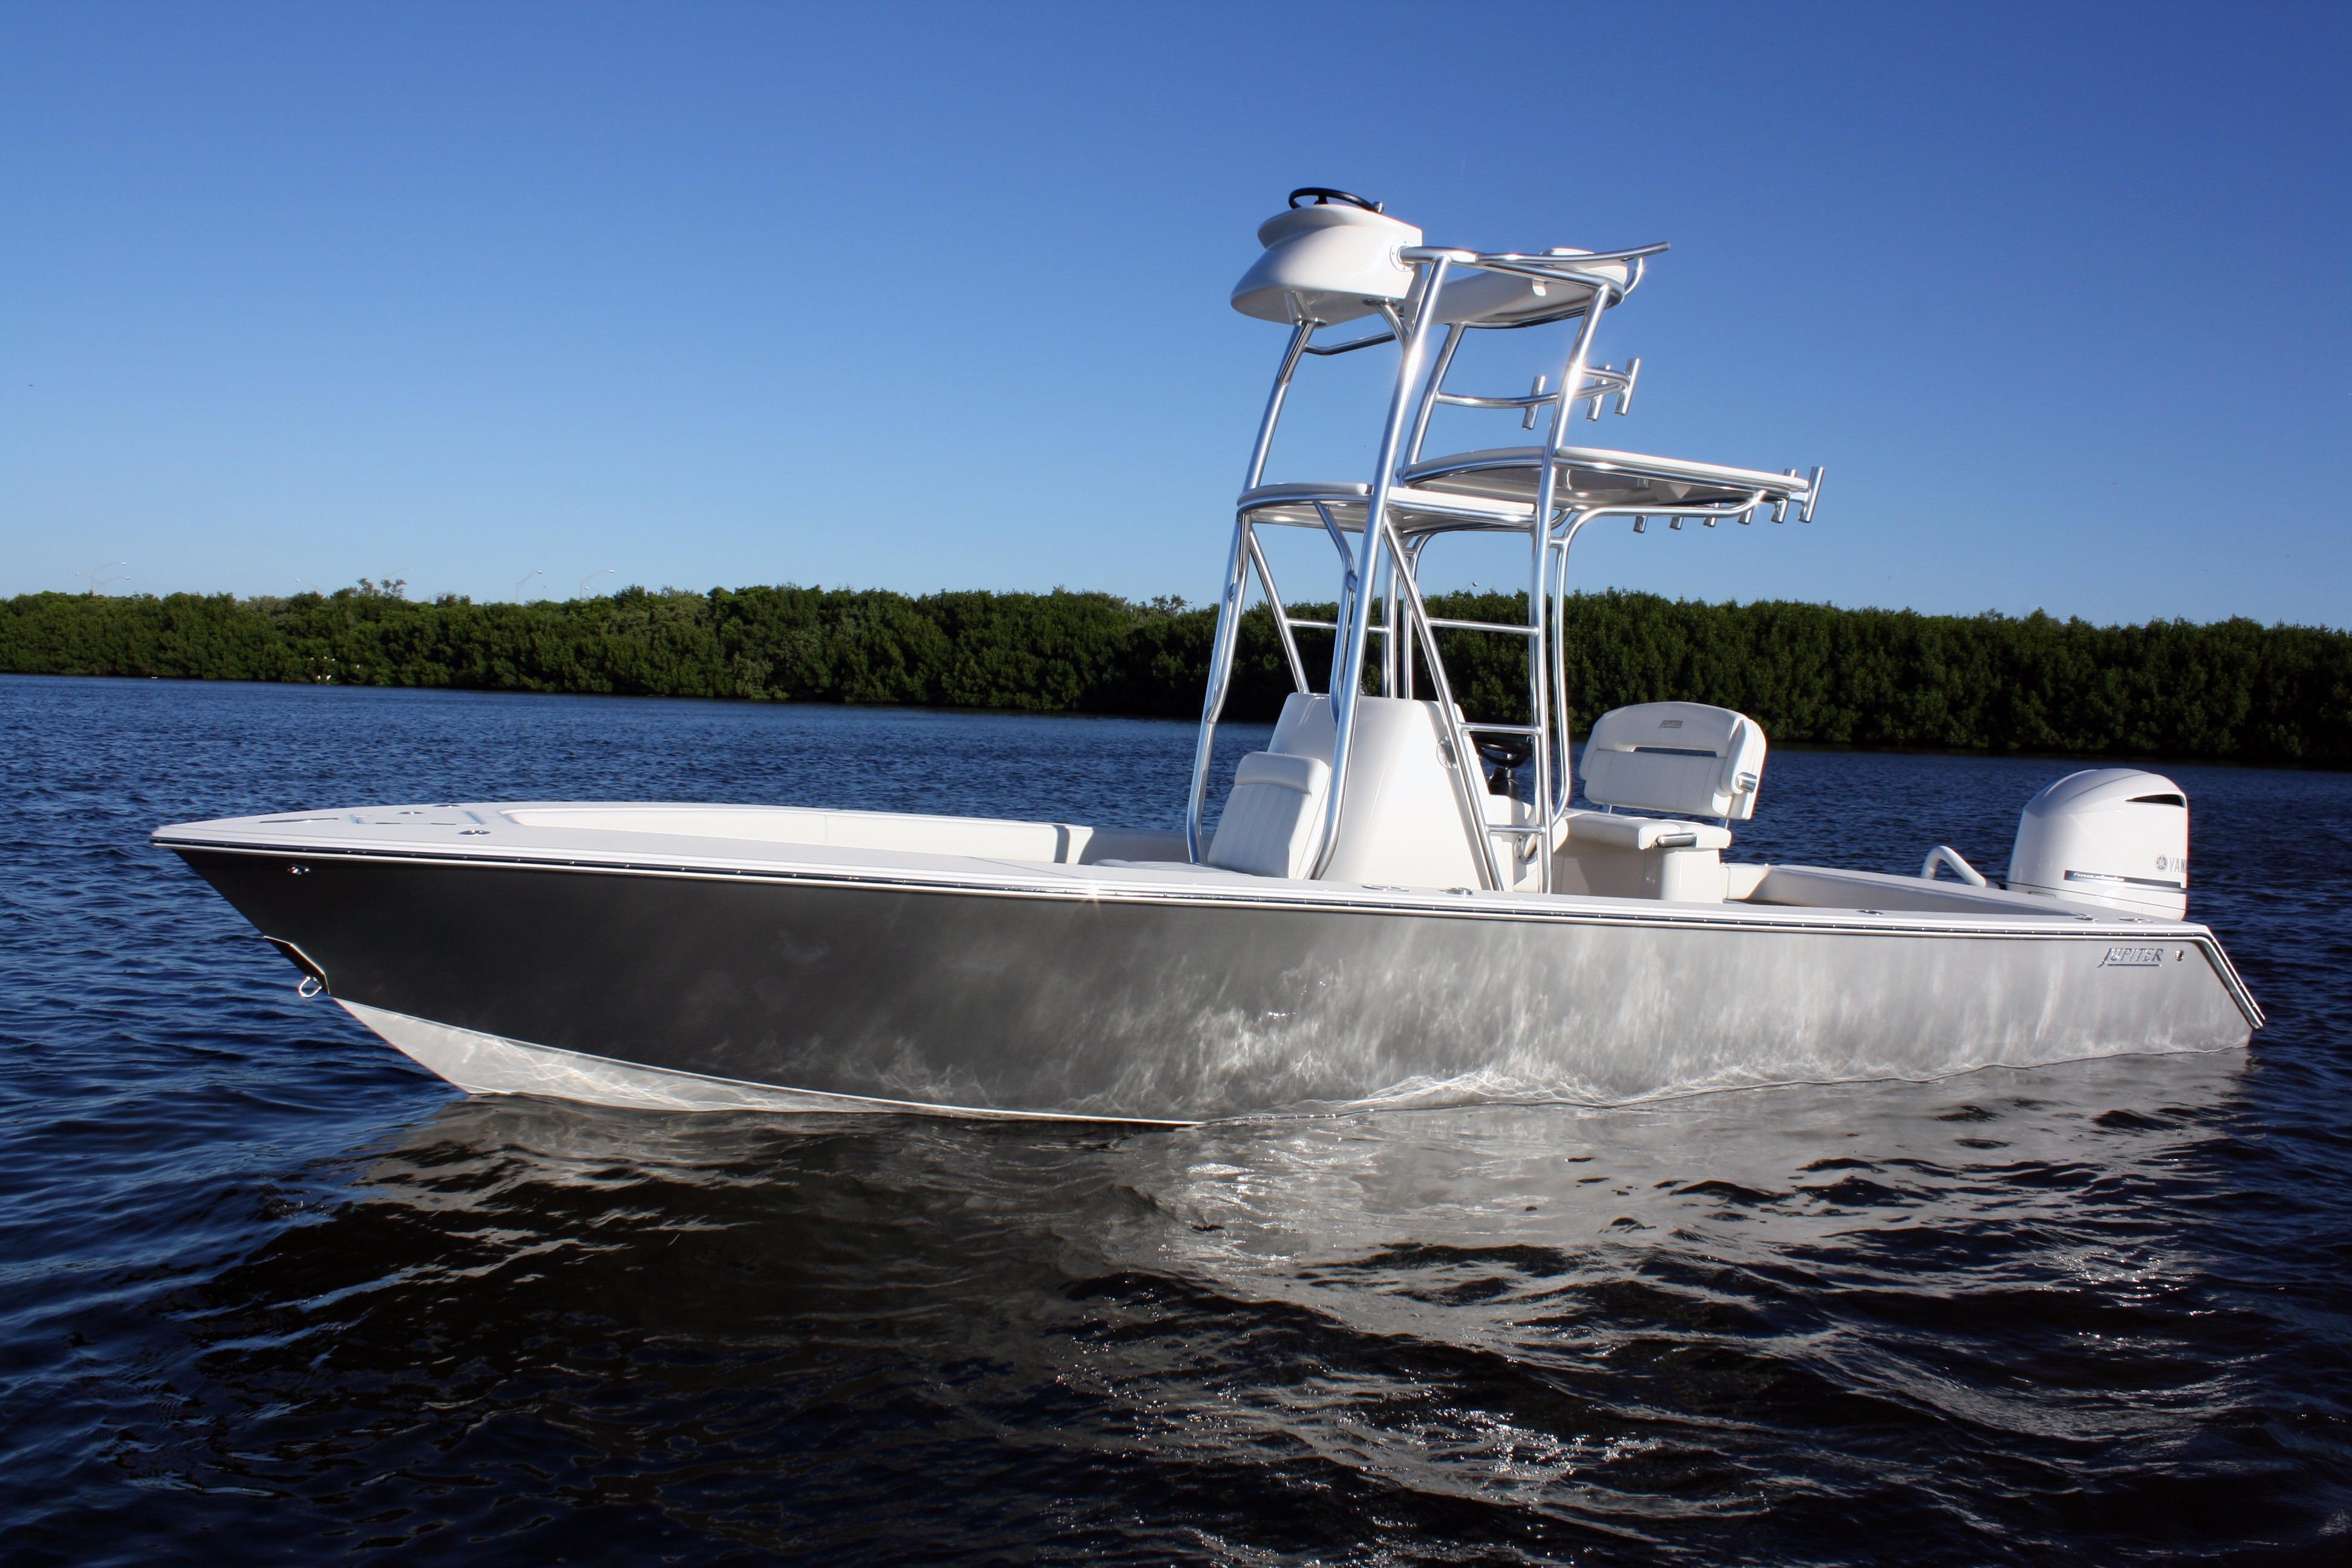 2019 Jupiter 25 Bay Power Boat For Sale Wwwyachtworldcom